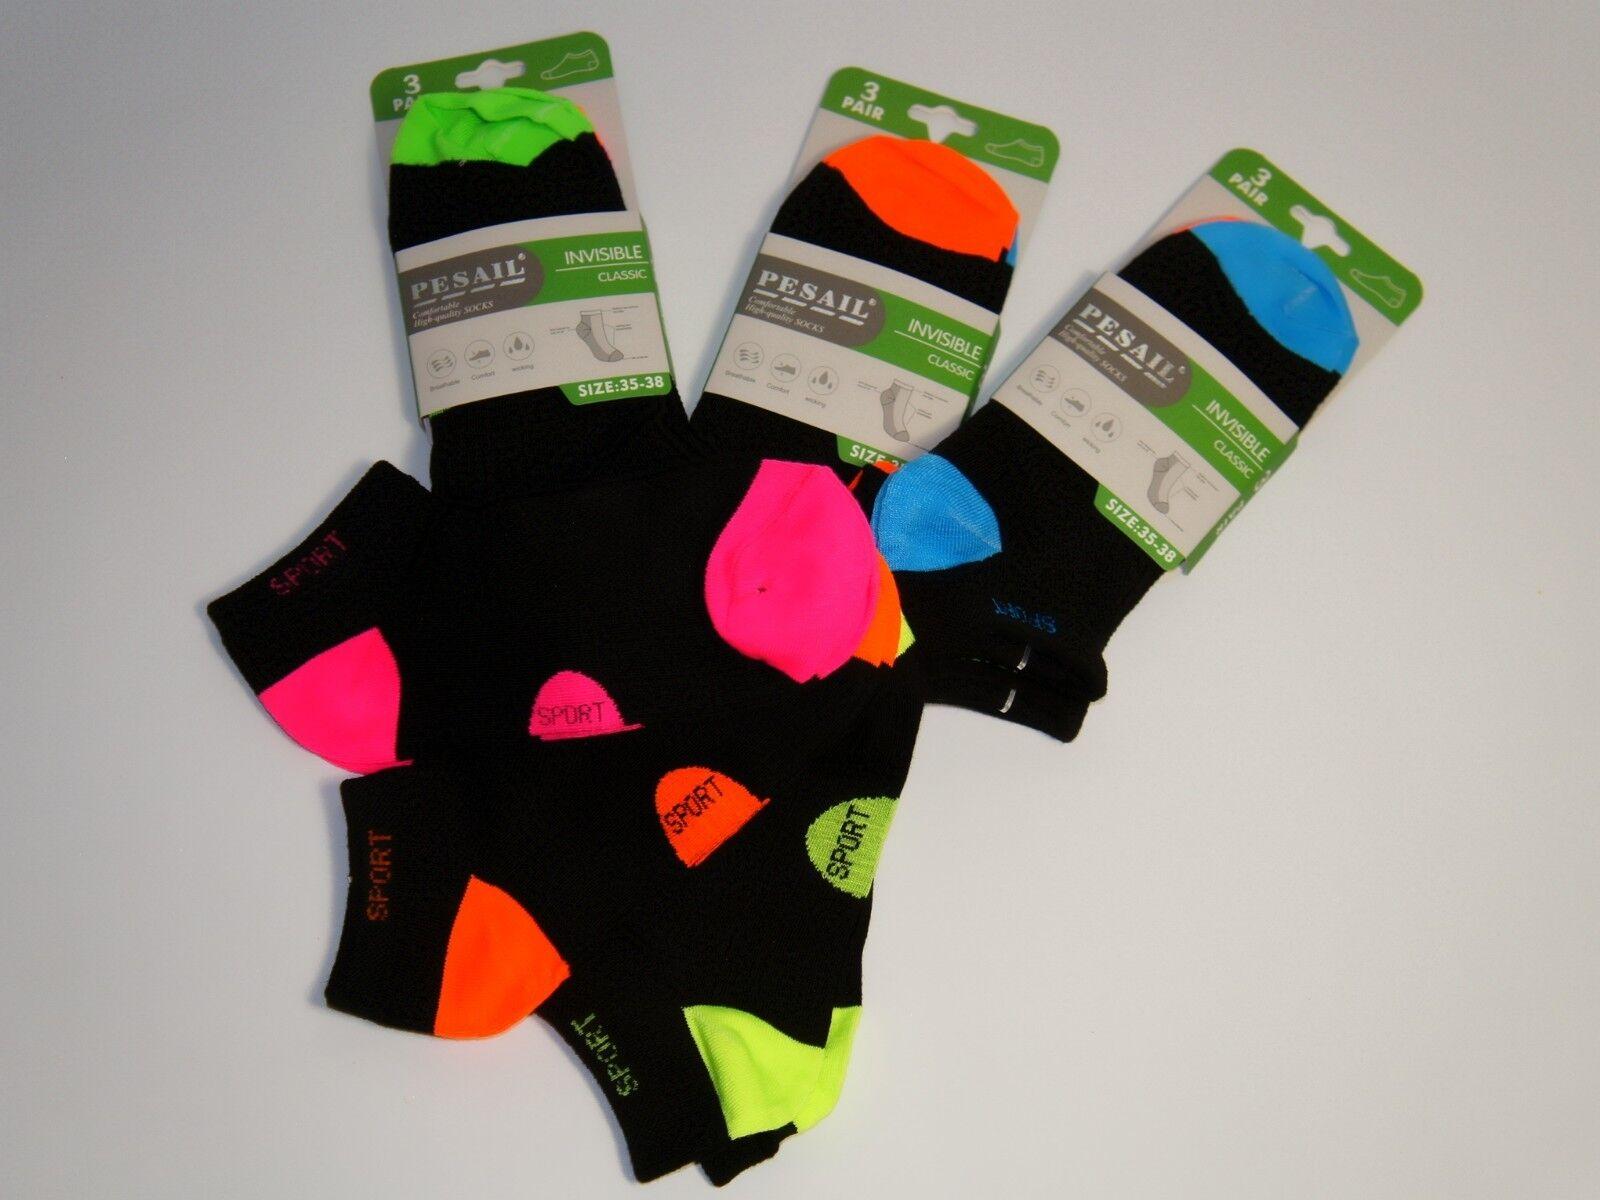 Socken 3er Set Sportsocken Kindersocken Sneaker-Socken Strümpfe Mädchen Jungen